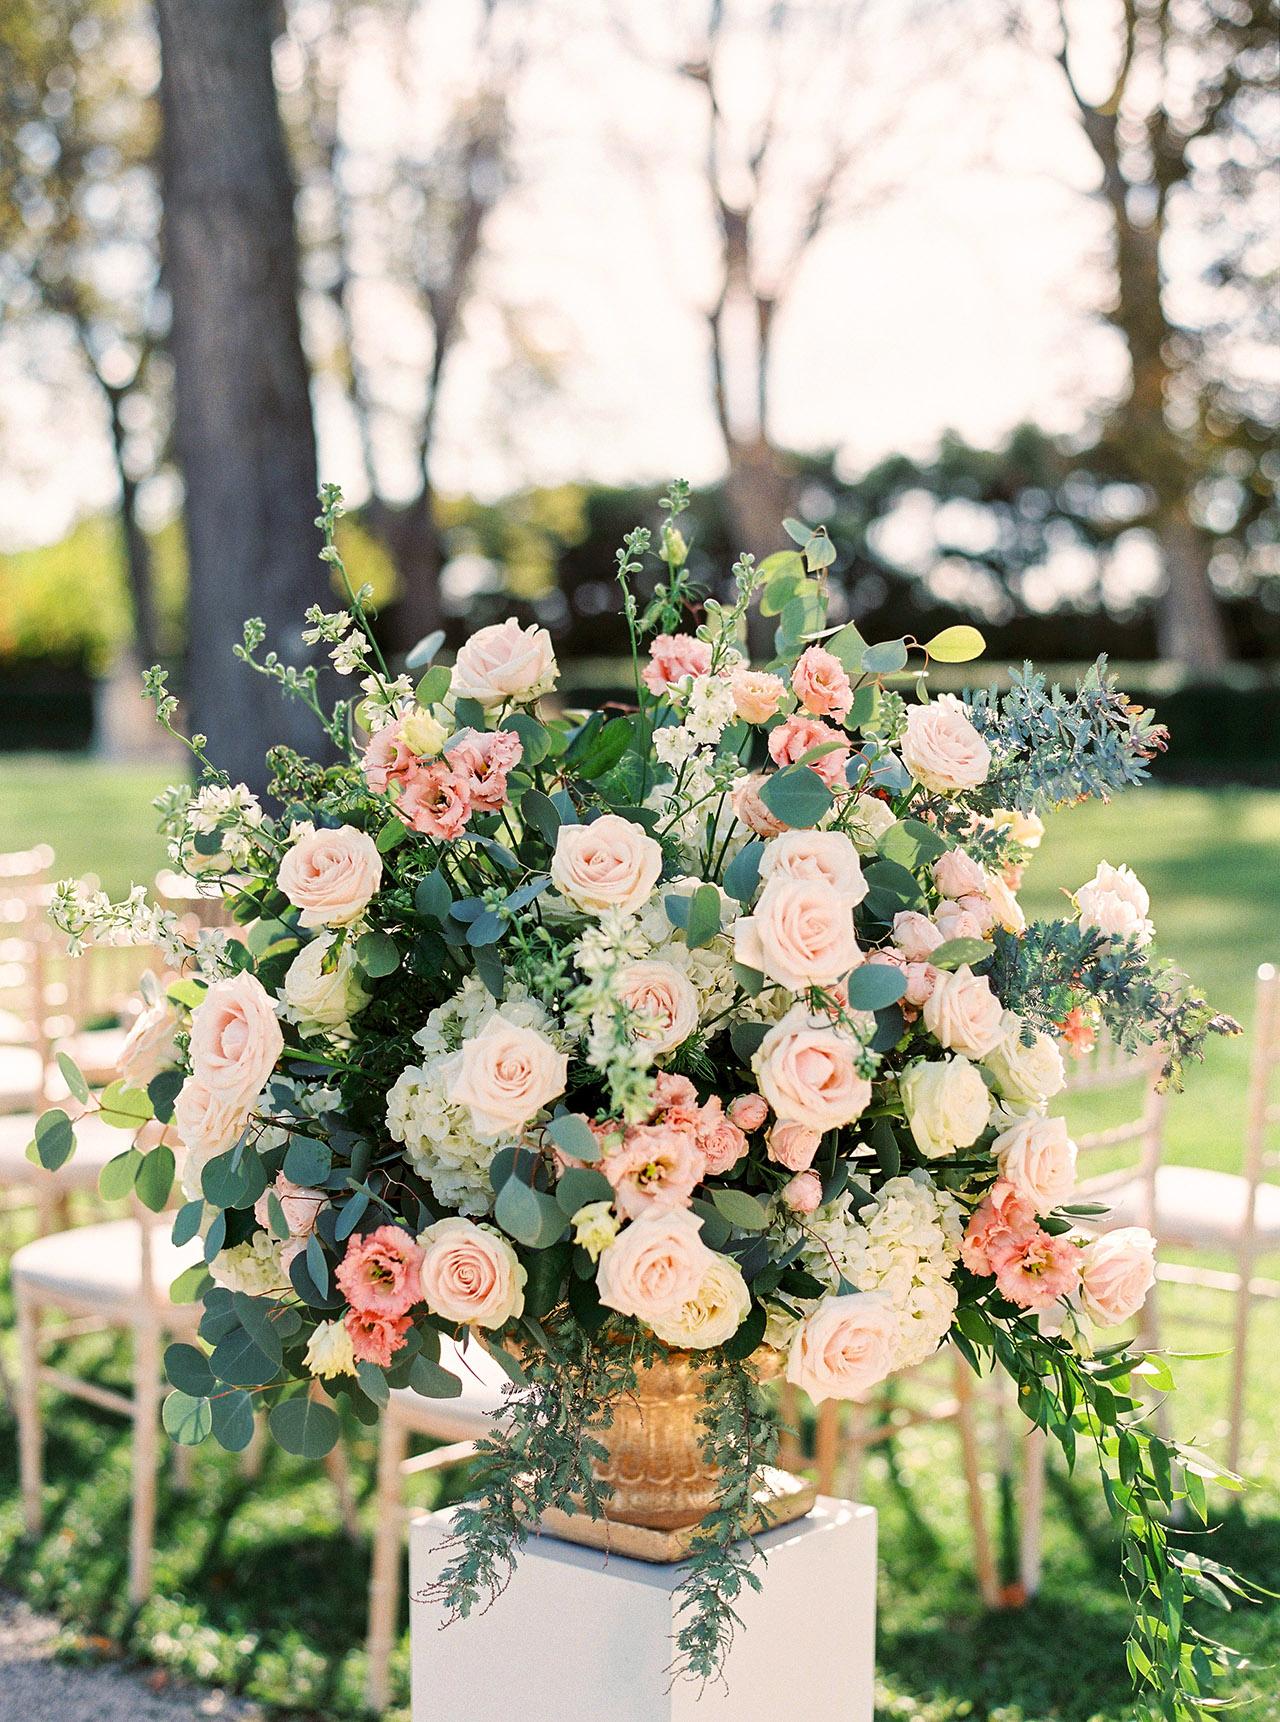 nancy sangho wedding ceremony flowers